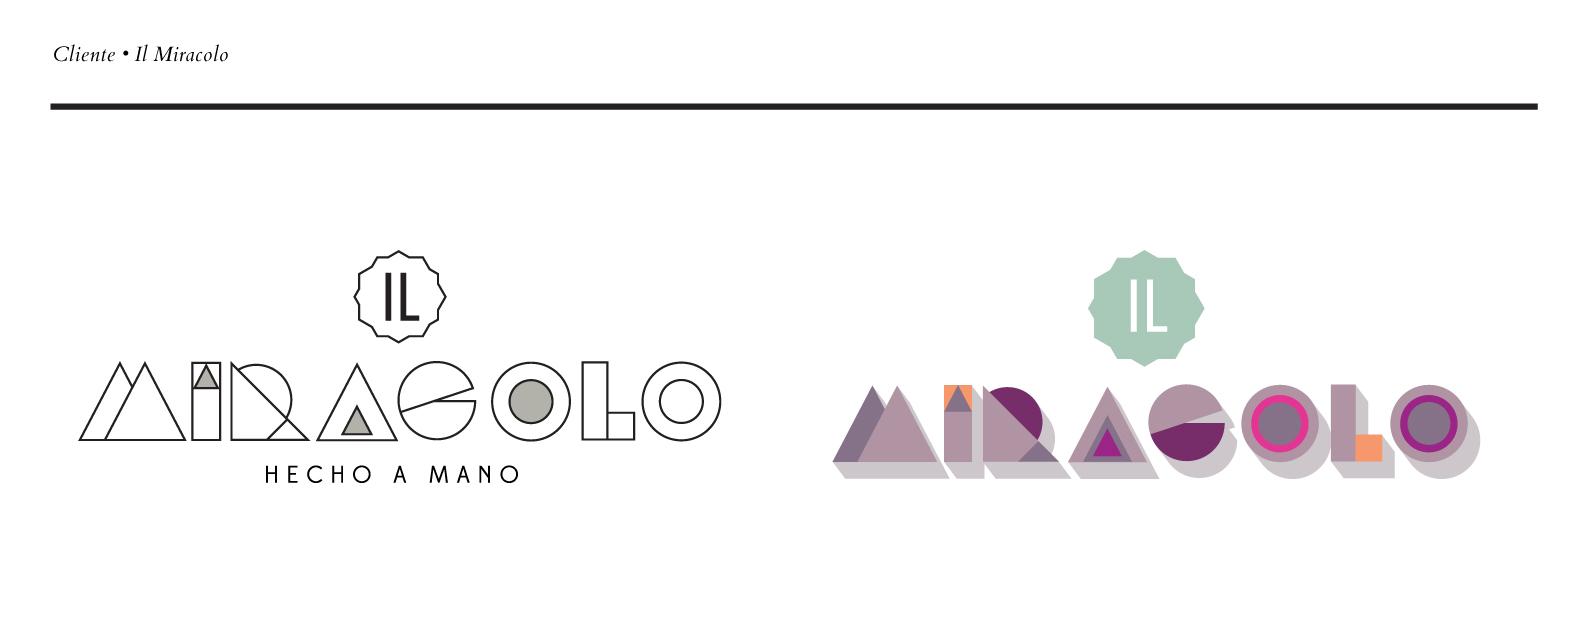 logos-2-v2-05